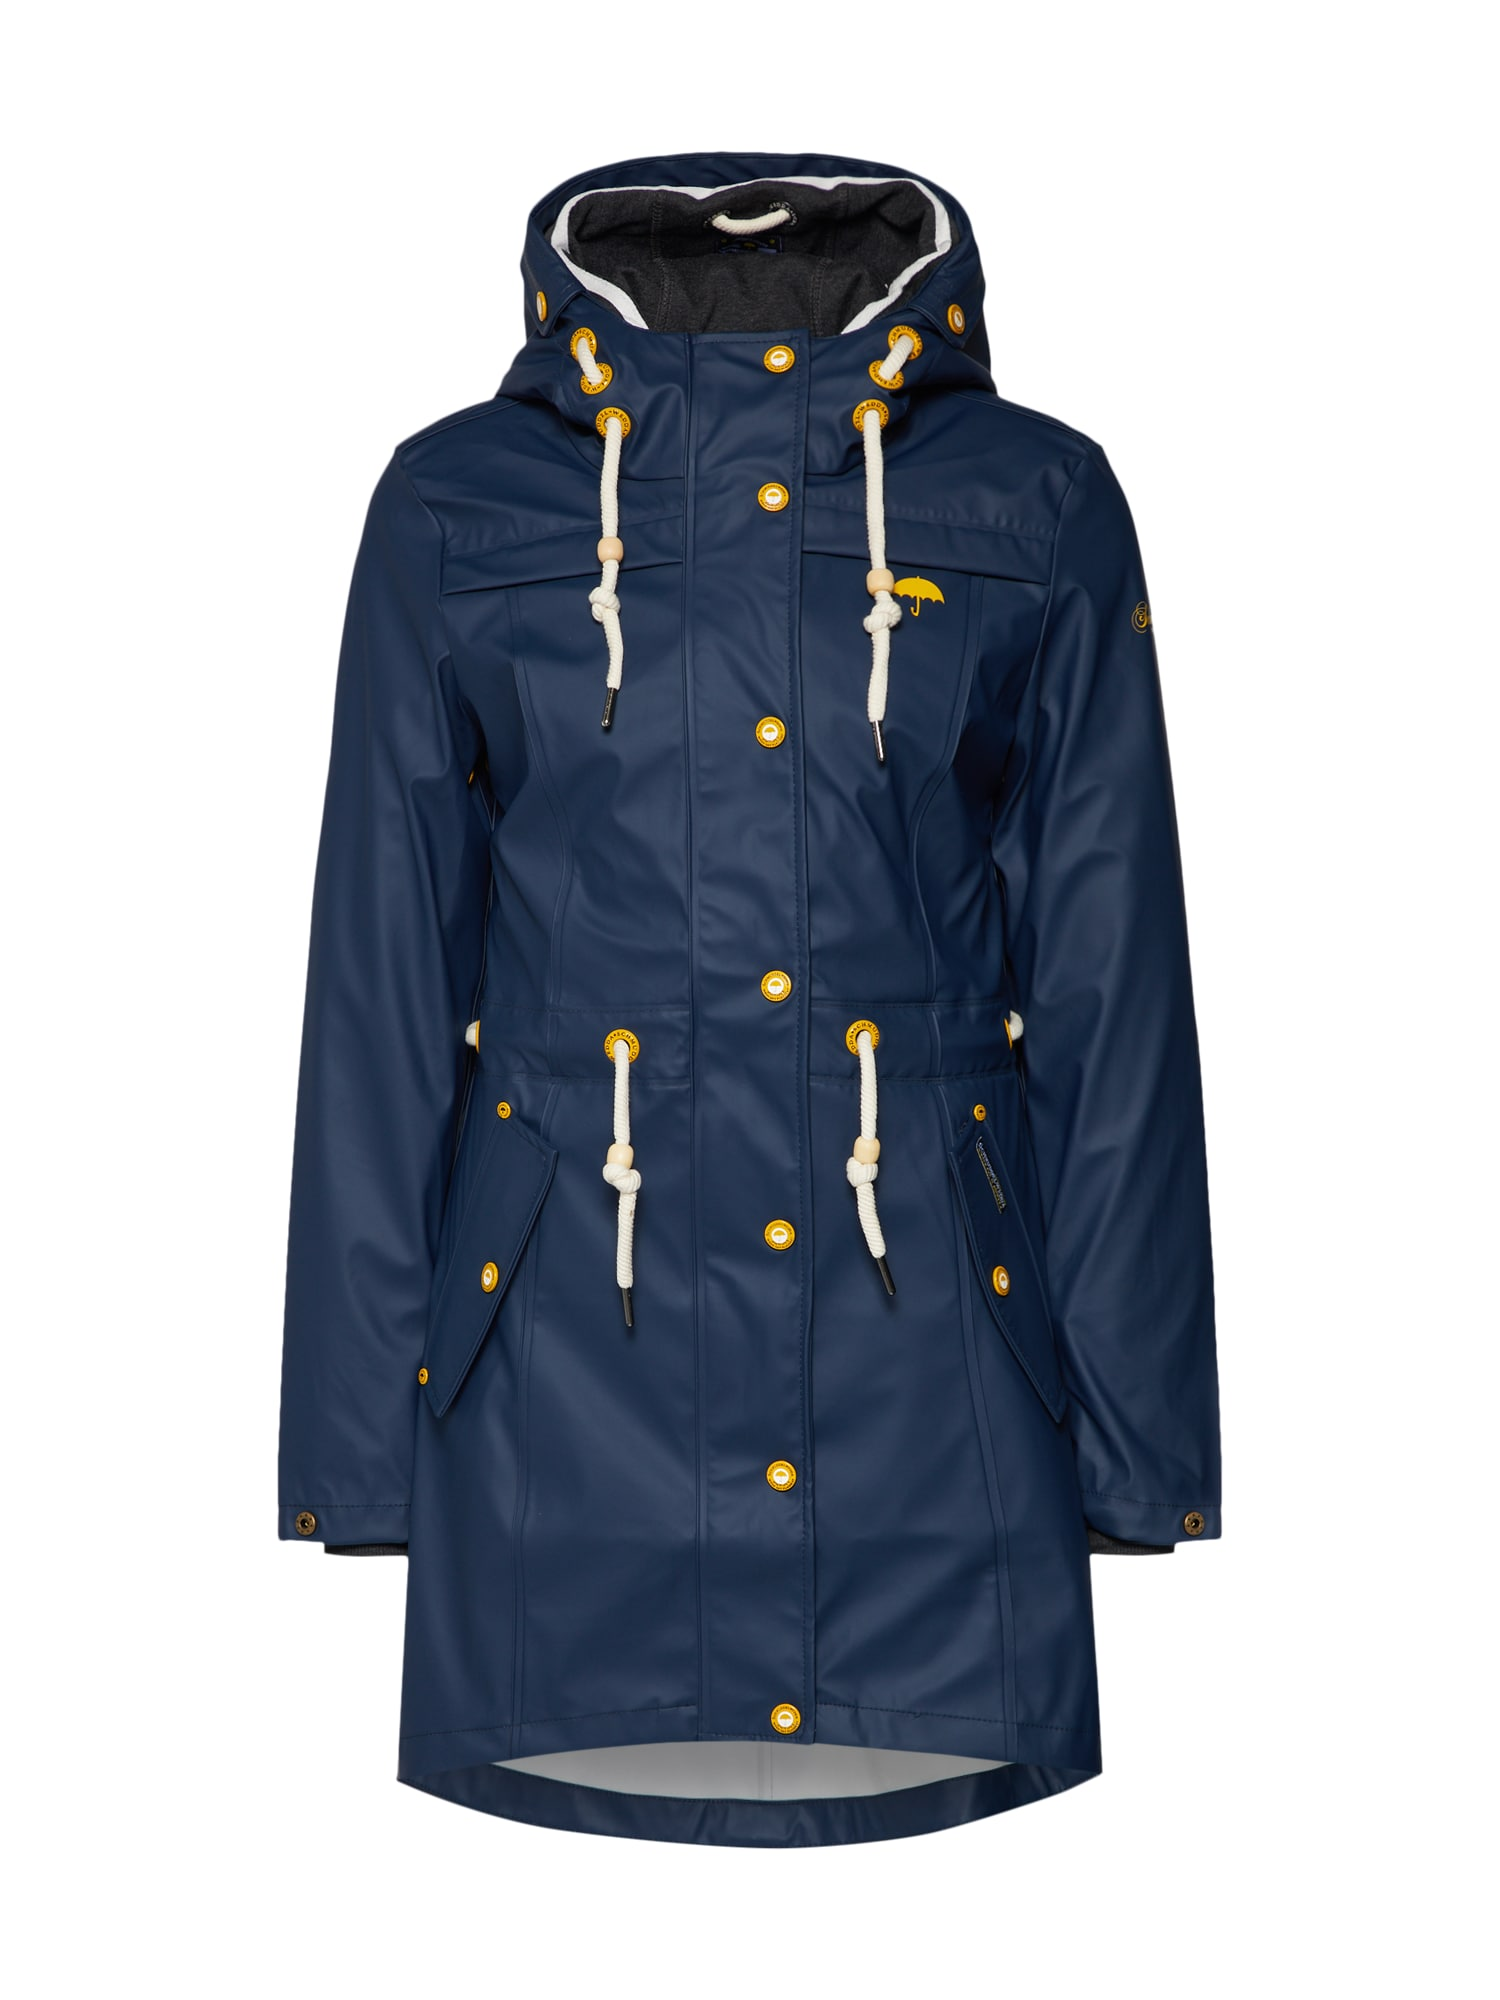 Přechodná bunda marine modrá Schmuddelwedda